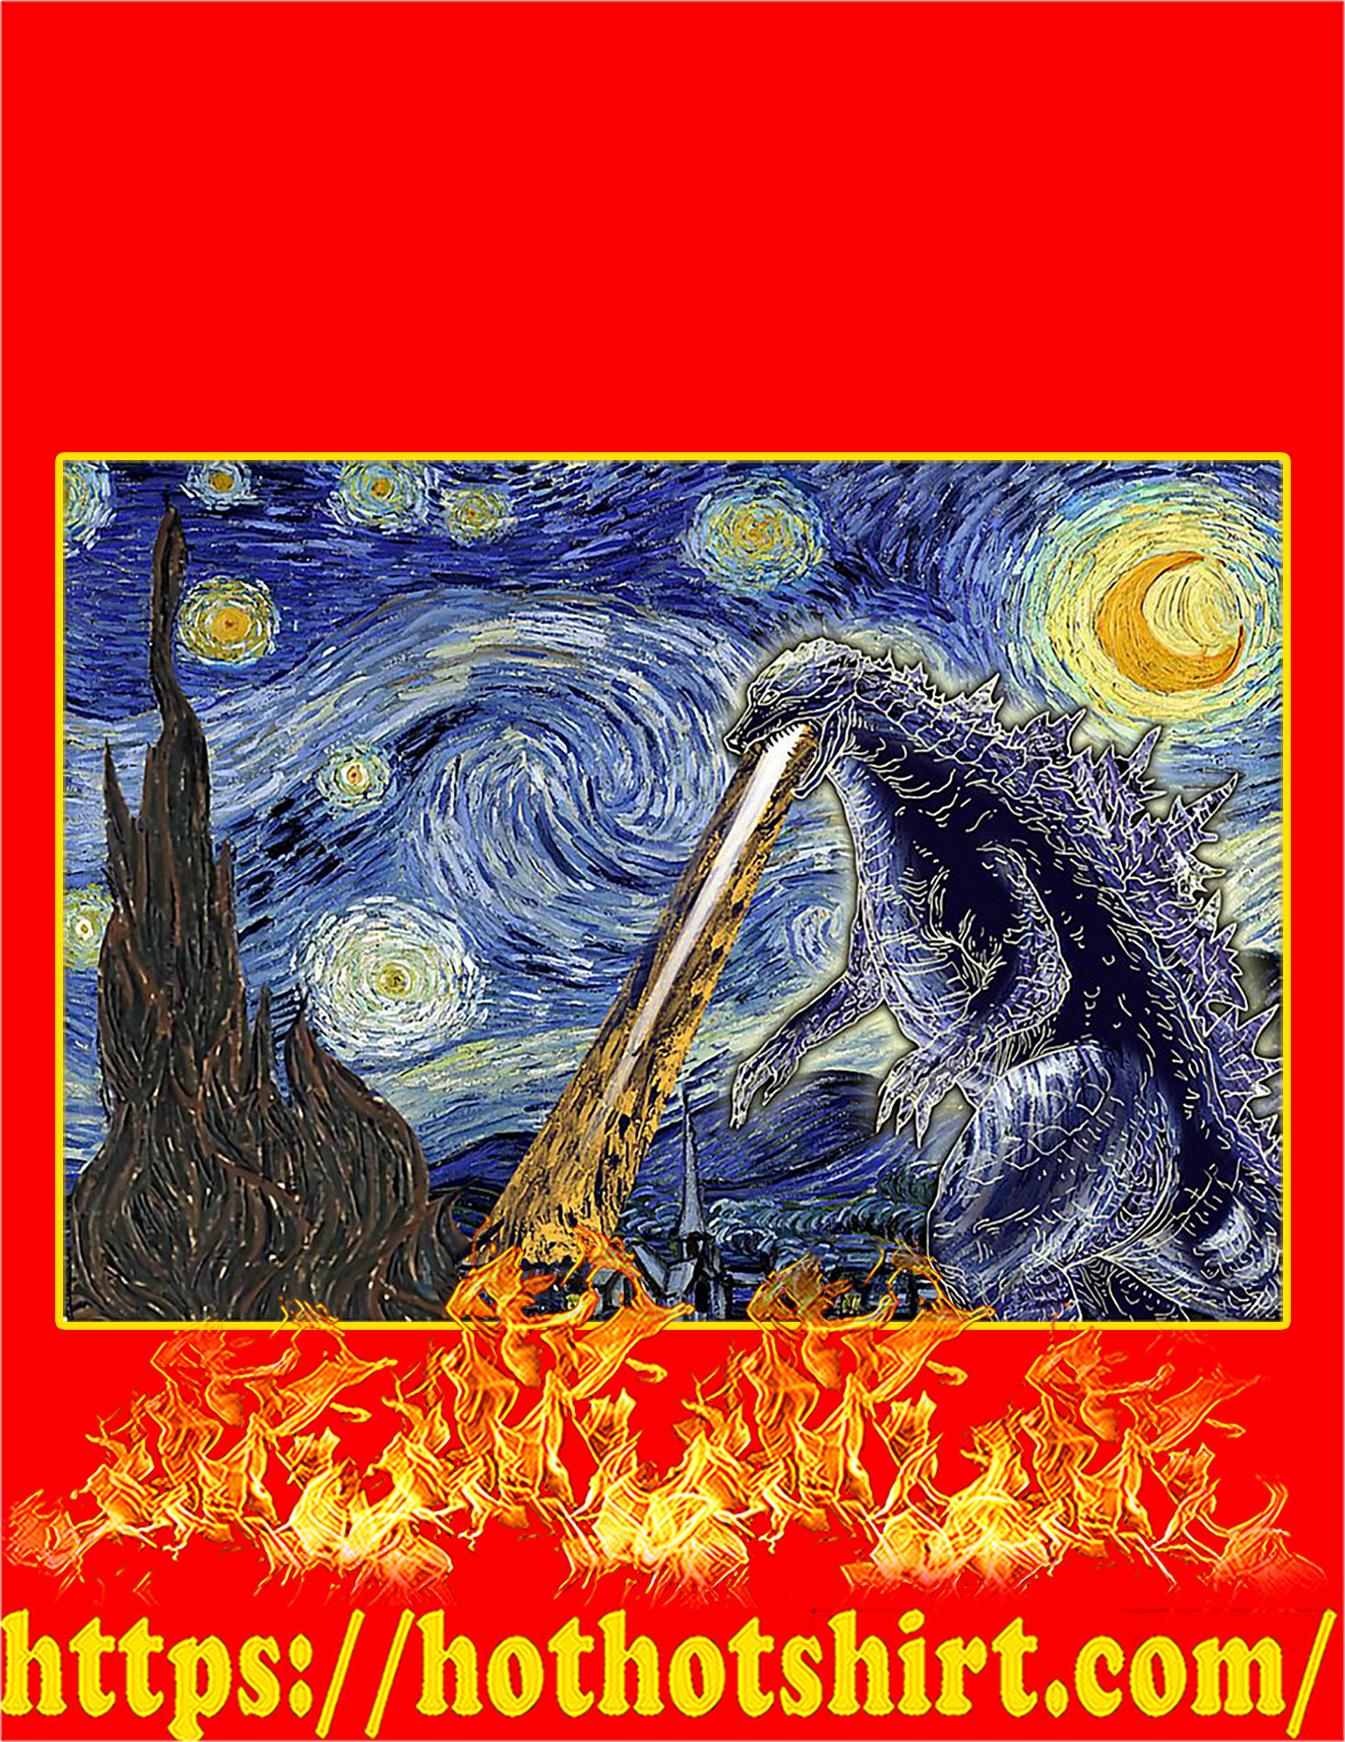 Godzilla starry night Van gogh poster - A2